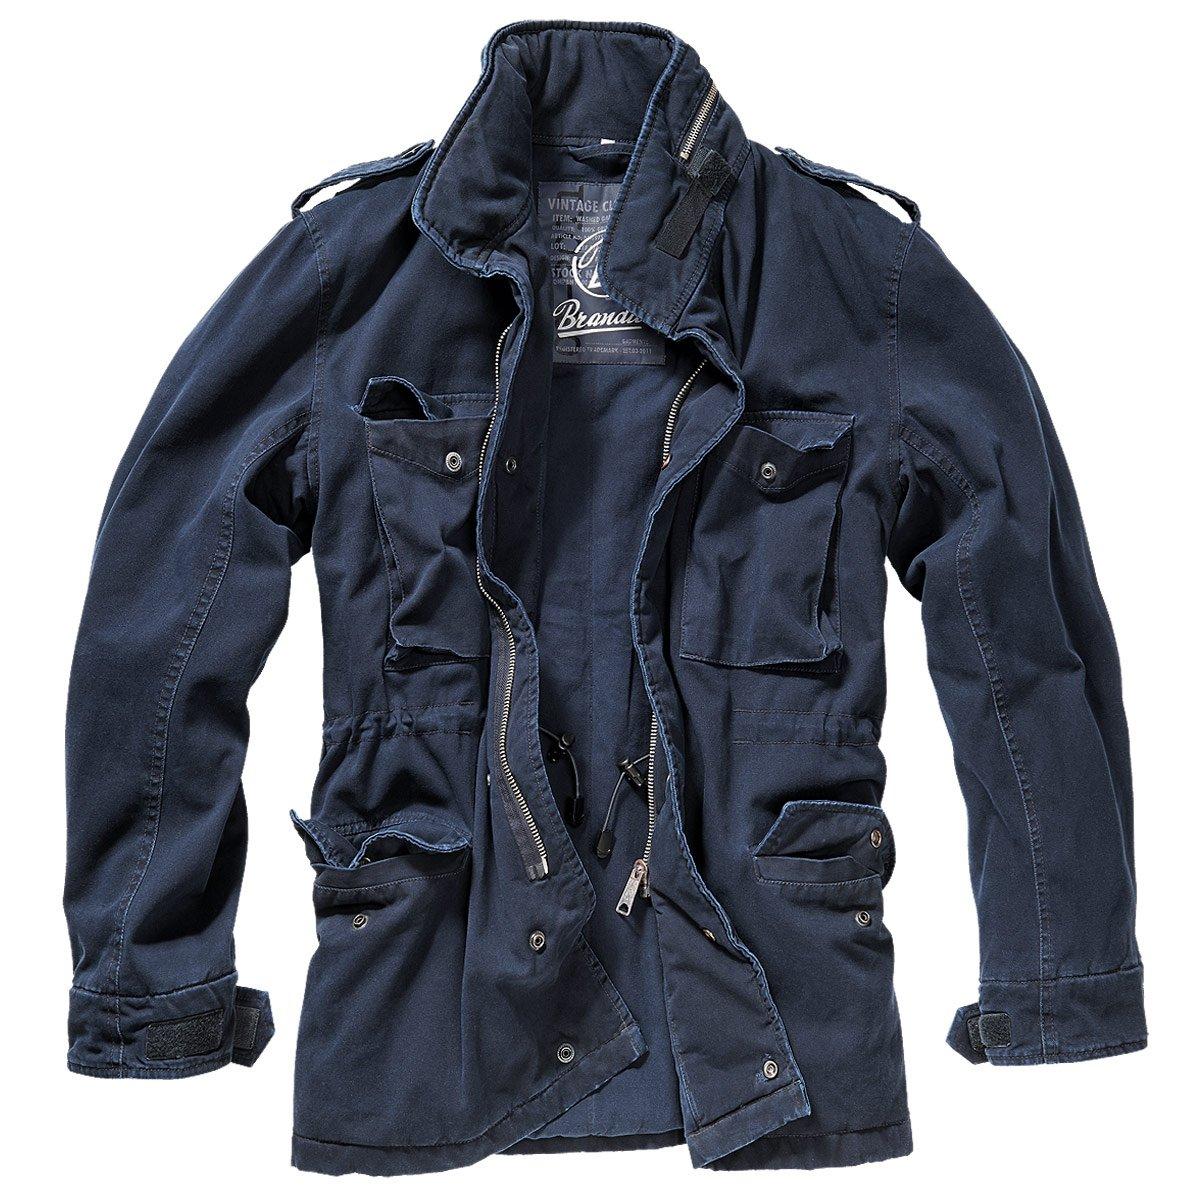 Brandit giacca invernale slavata M65